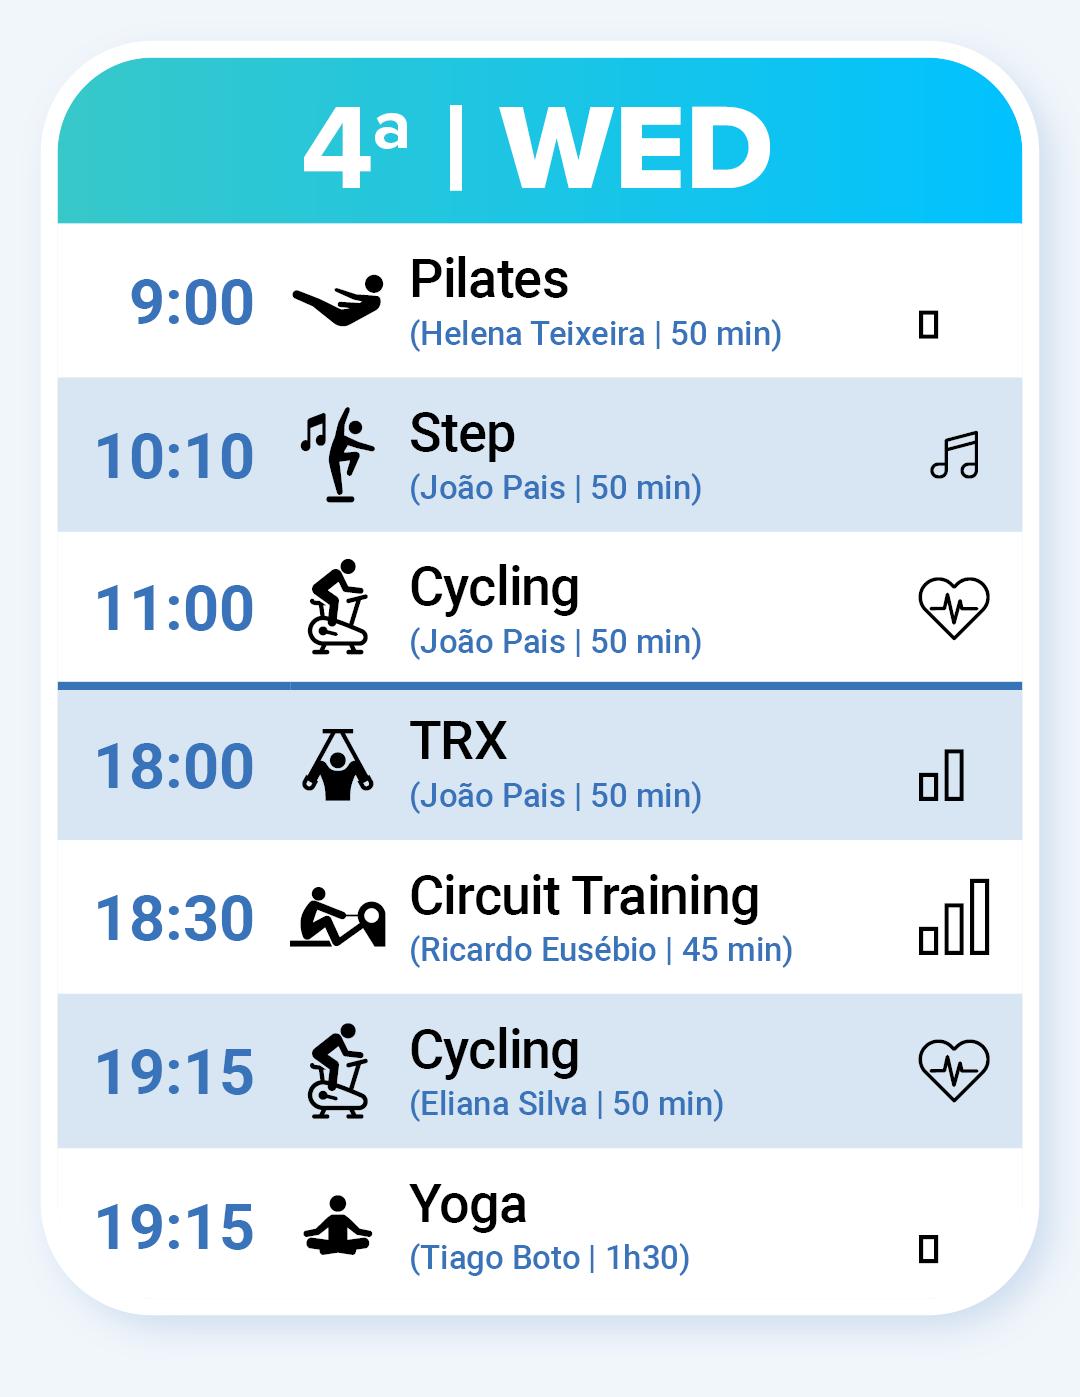 Aulas de Fitness na Quarta: Pilates às 9:00, Step às 10:10, Cycling às 11:00, TRX às 18:00, Circuit Training às 18:30, Cycling às 19:15 e Yoga às 19:15.